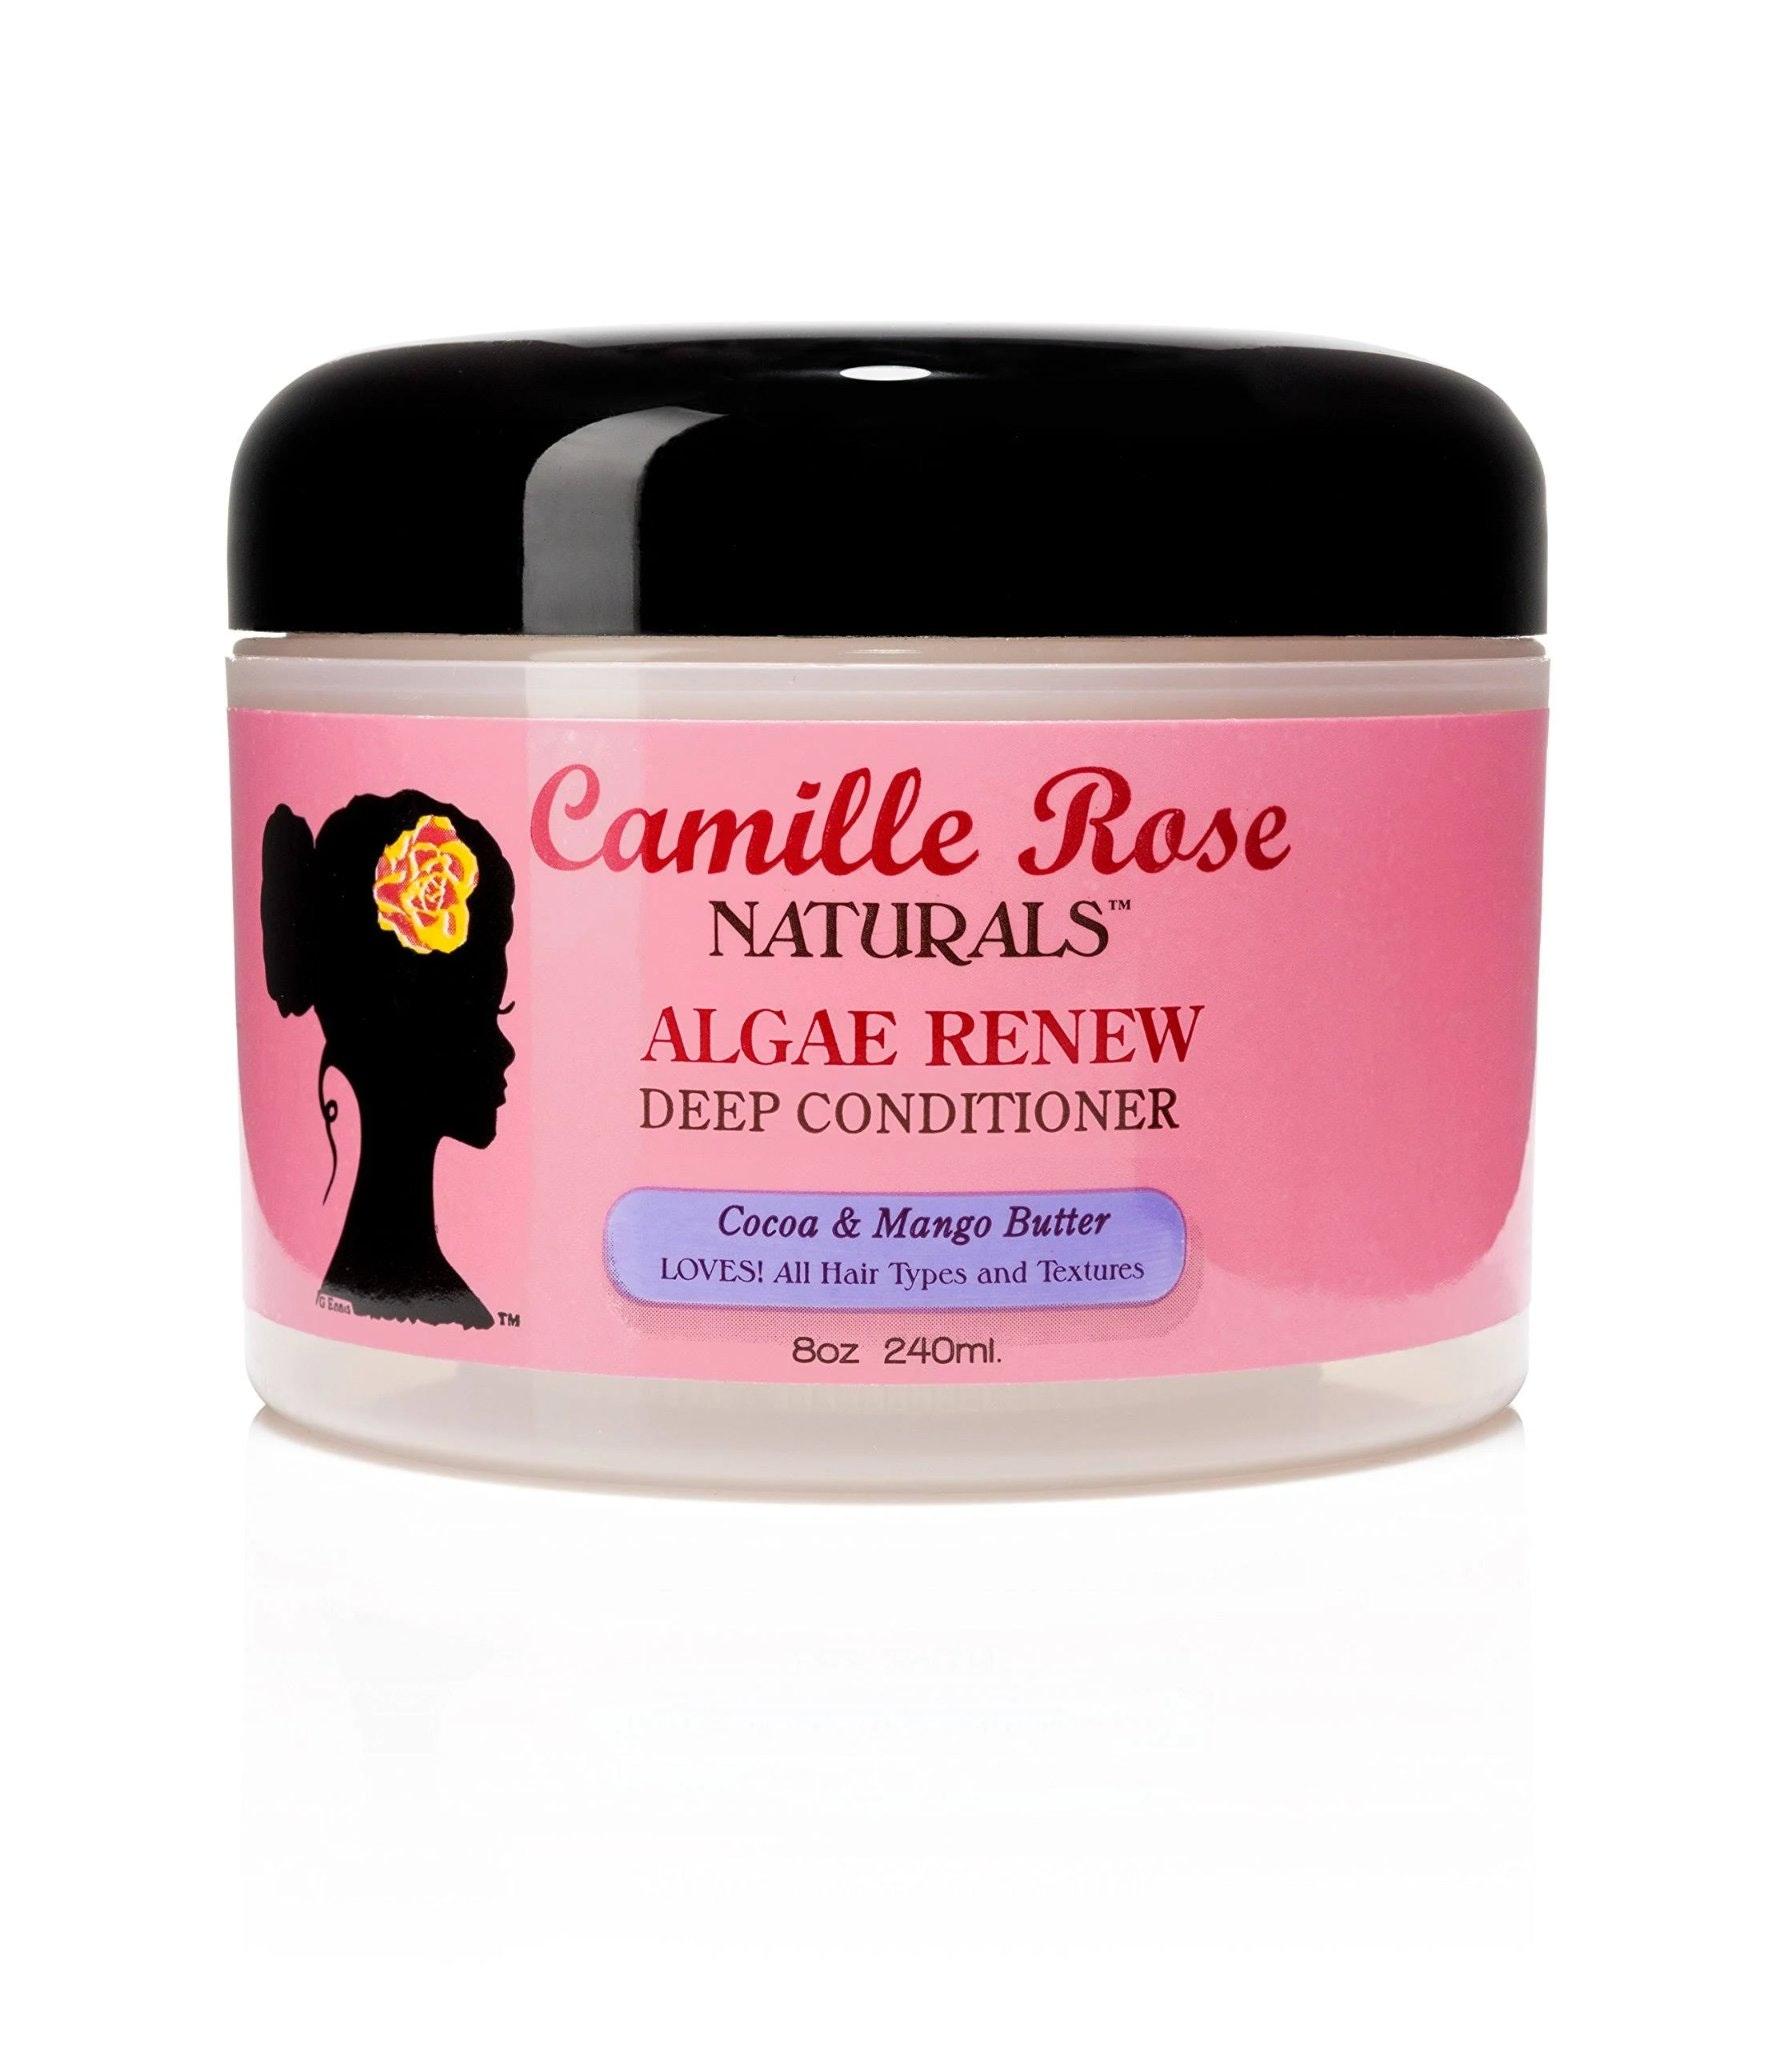 Camille Rose Algae Renew Deep Condioning Mask